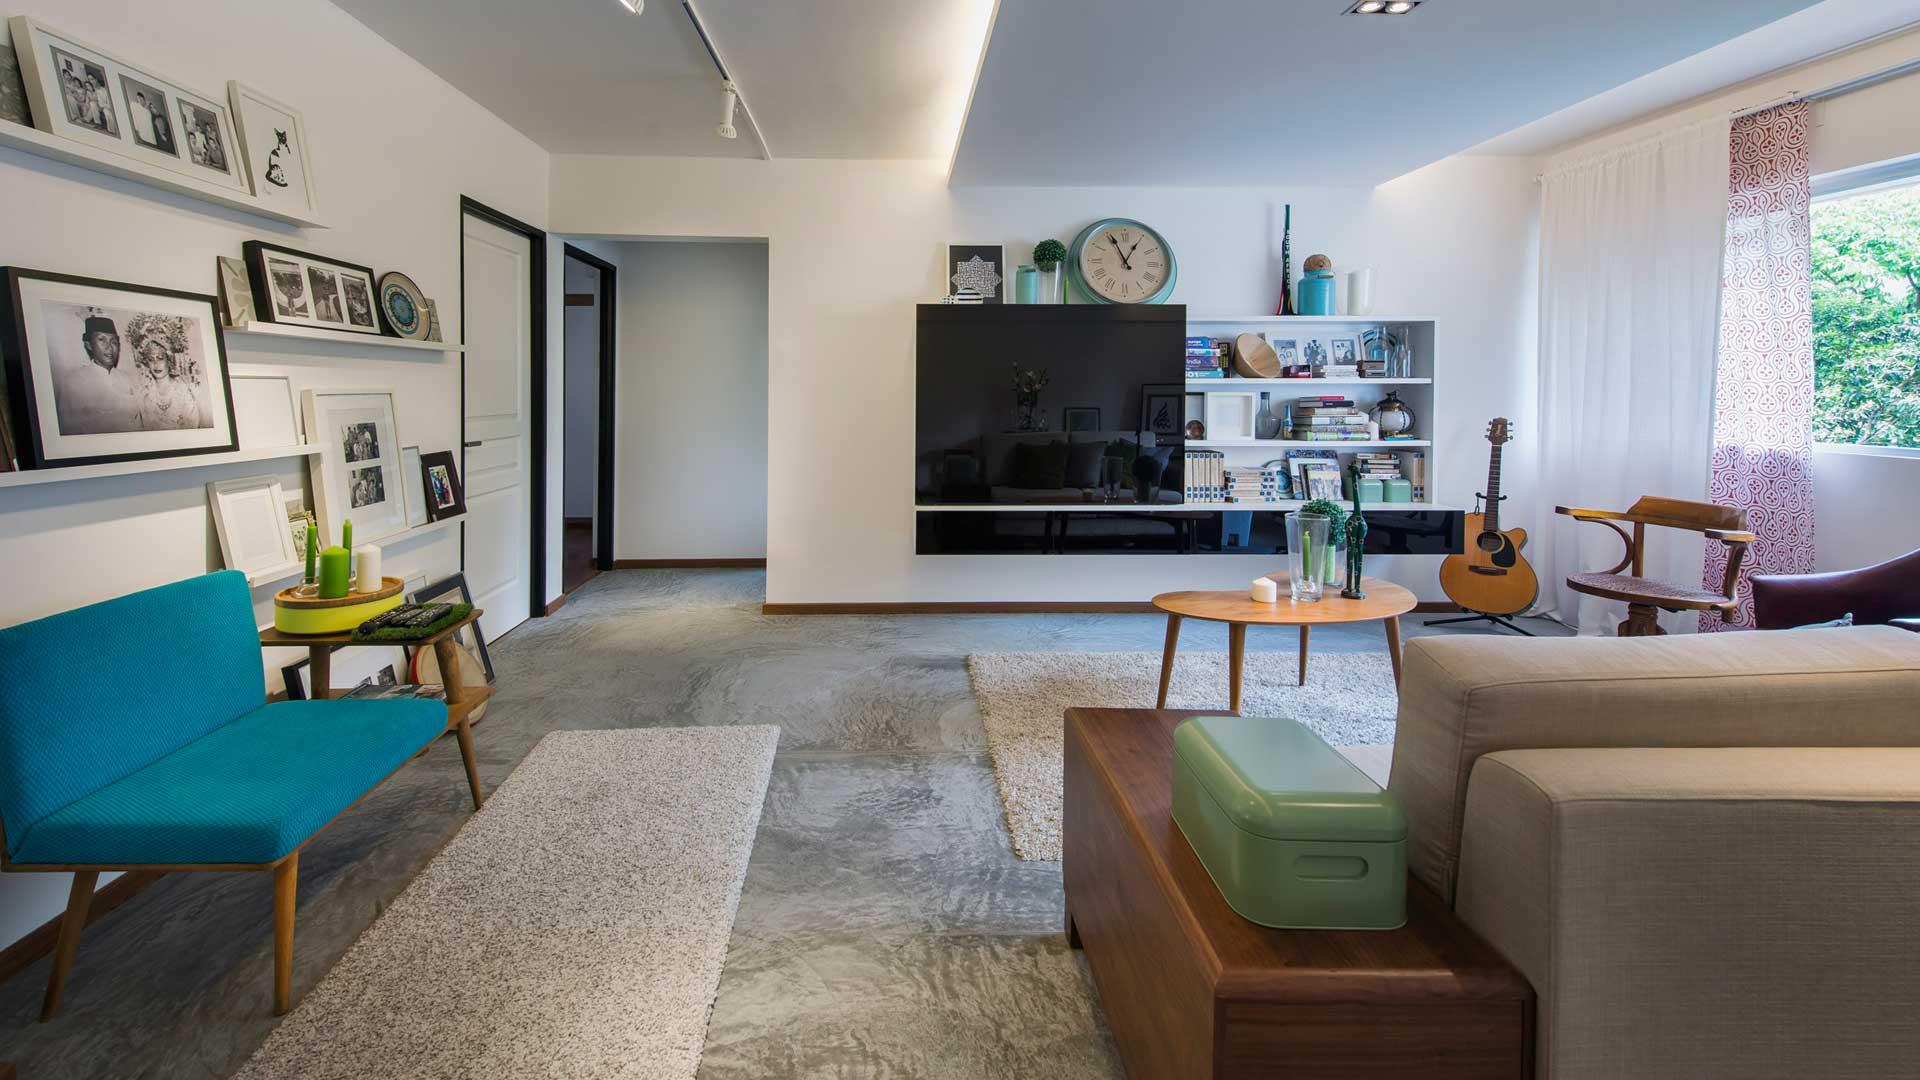 Award winning singapore interior design m3studio for Top 100 interior design firms in singapore